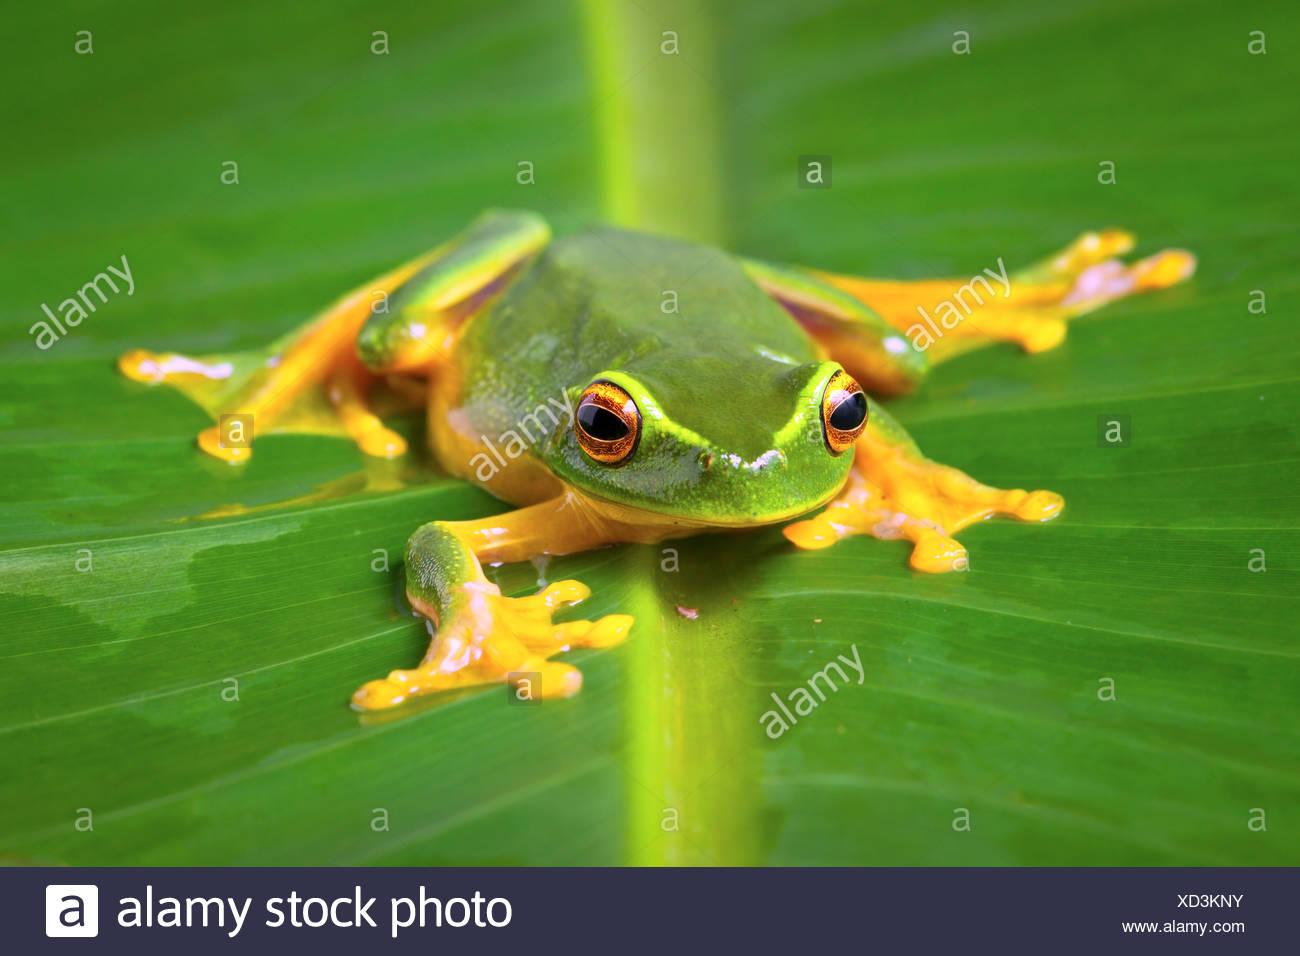 Beautiful Orange thighed tree frog, Litoria zanthomera, sitting on a leaf looking at camera - Stock Image